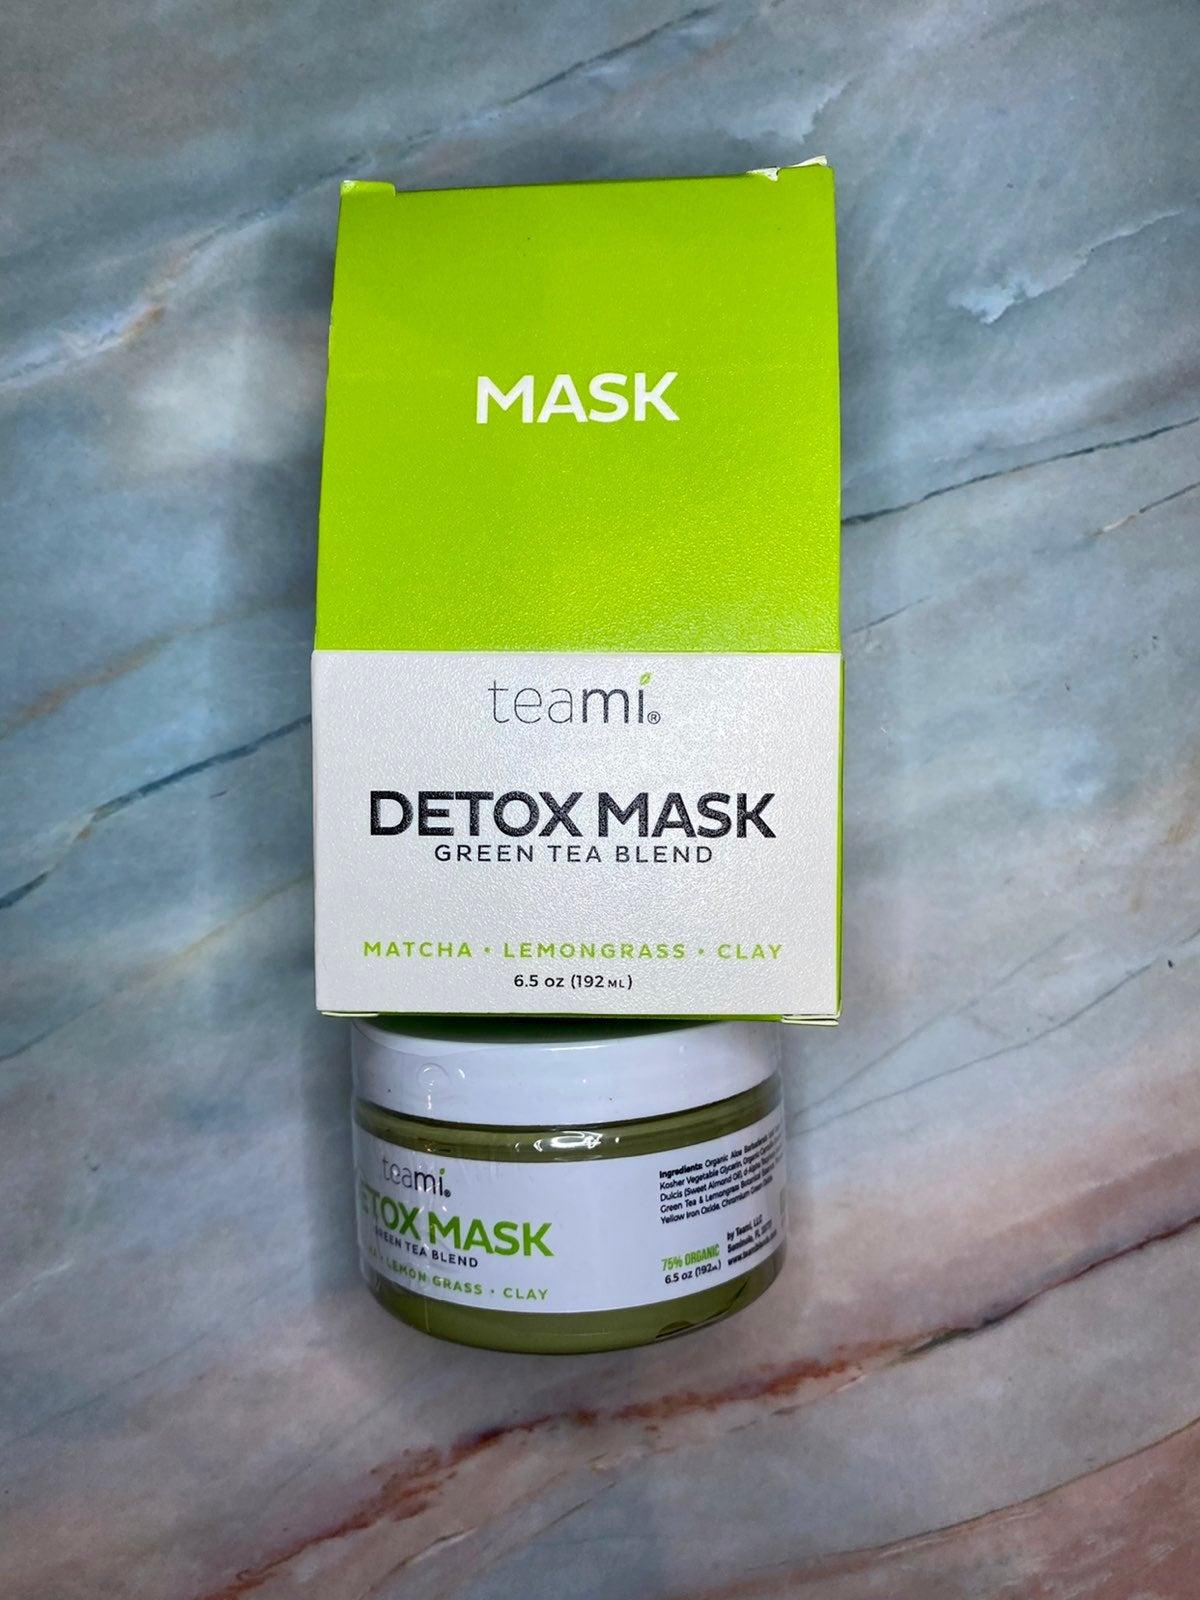 Teami green tea mask